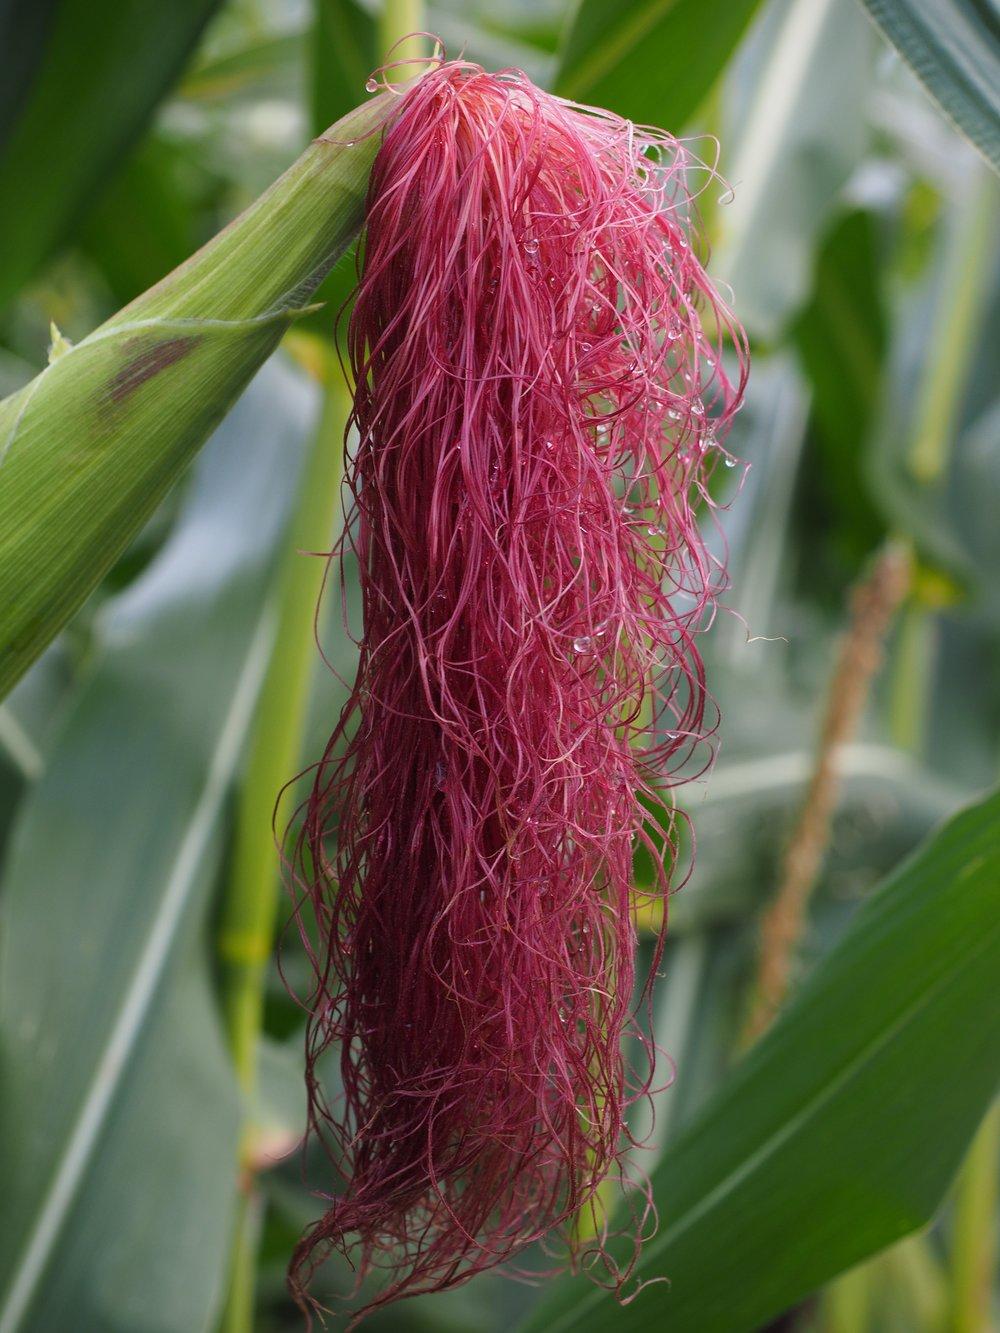 corn-hair-694217.jpg